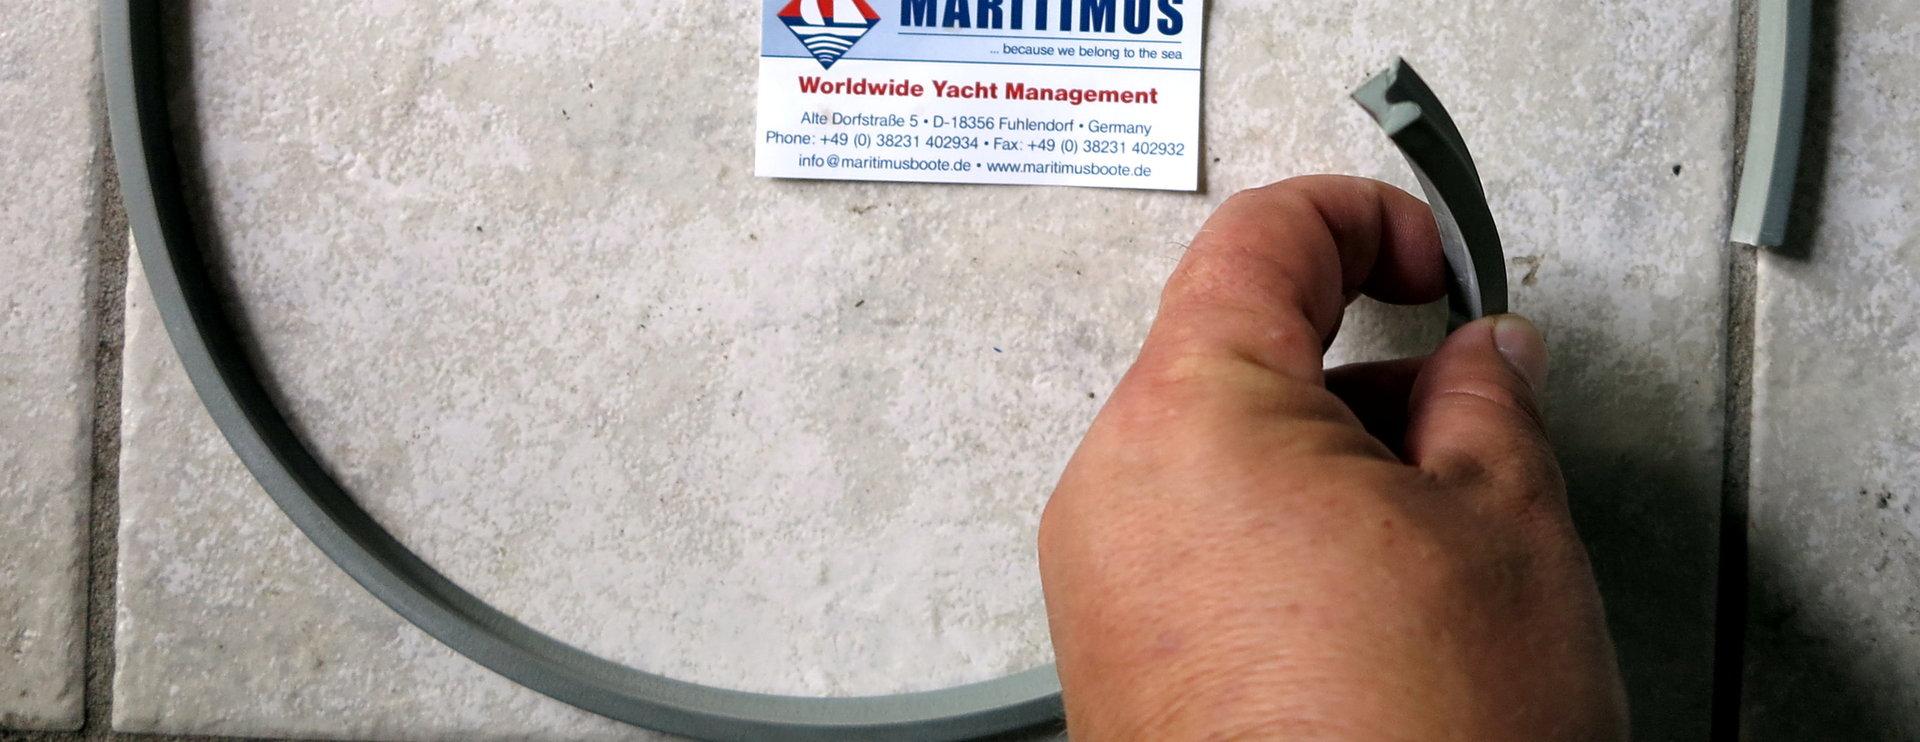 Inc. Hand Retractable Spring Plunger LPR100 Hand Retractable Spring Plunger S/&W Manufacturing Co